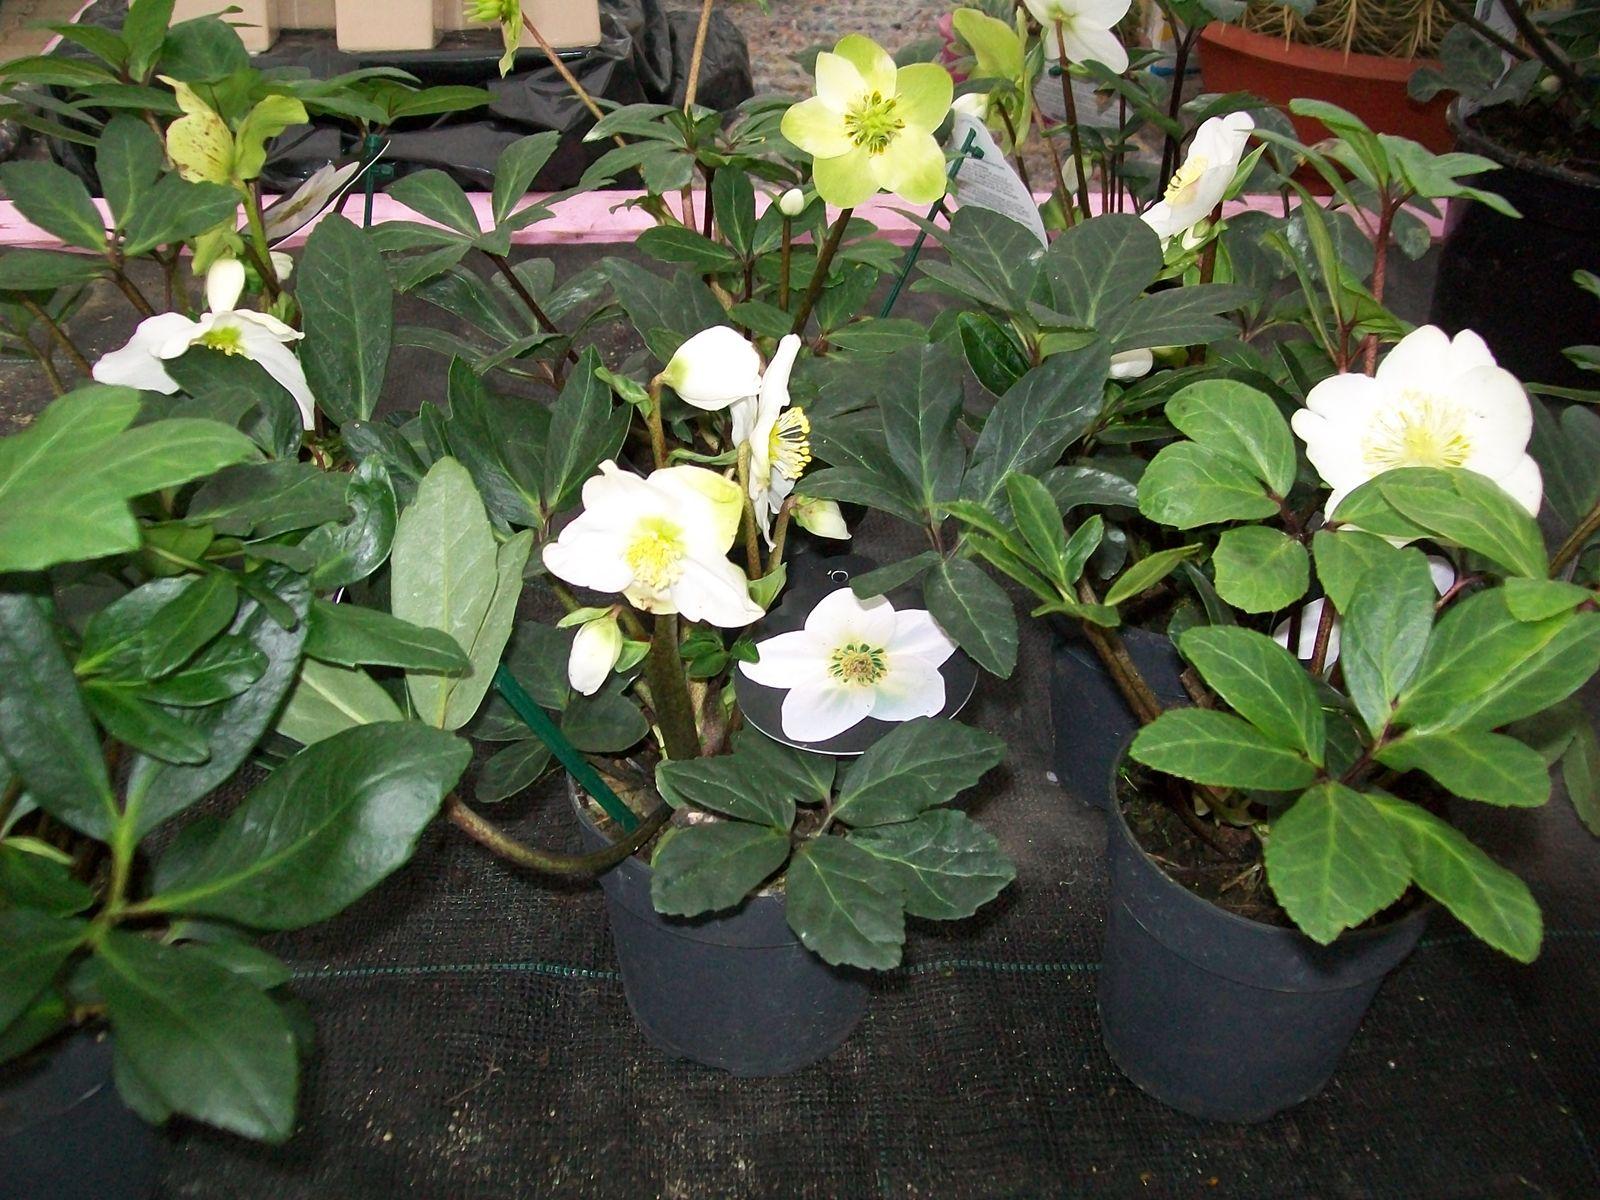 Jardini re pour balcon terrasse en hivers - Rose de noel en pot ...